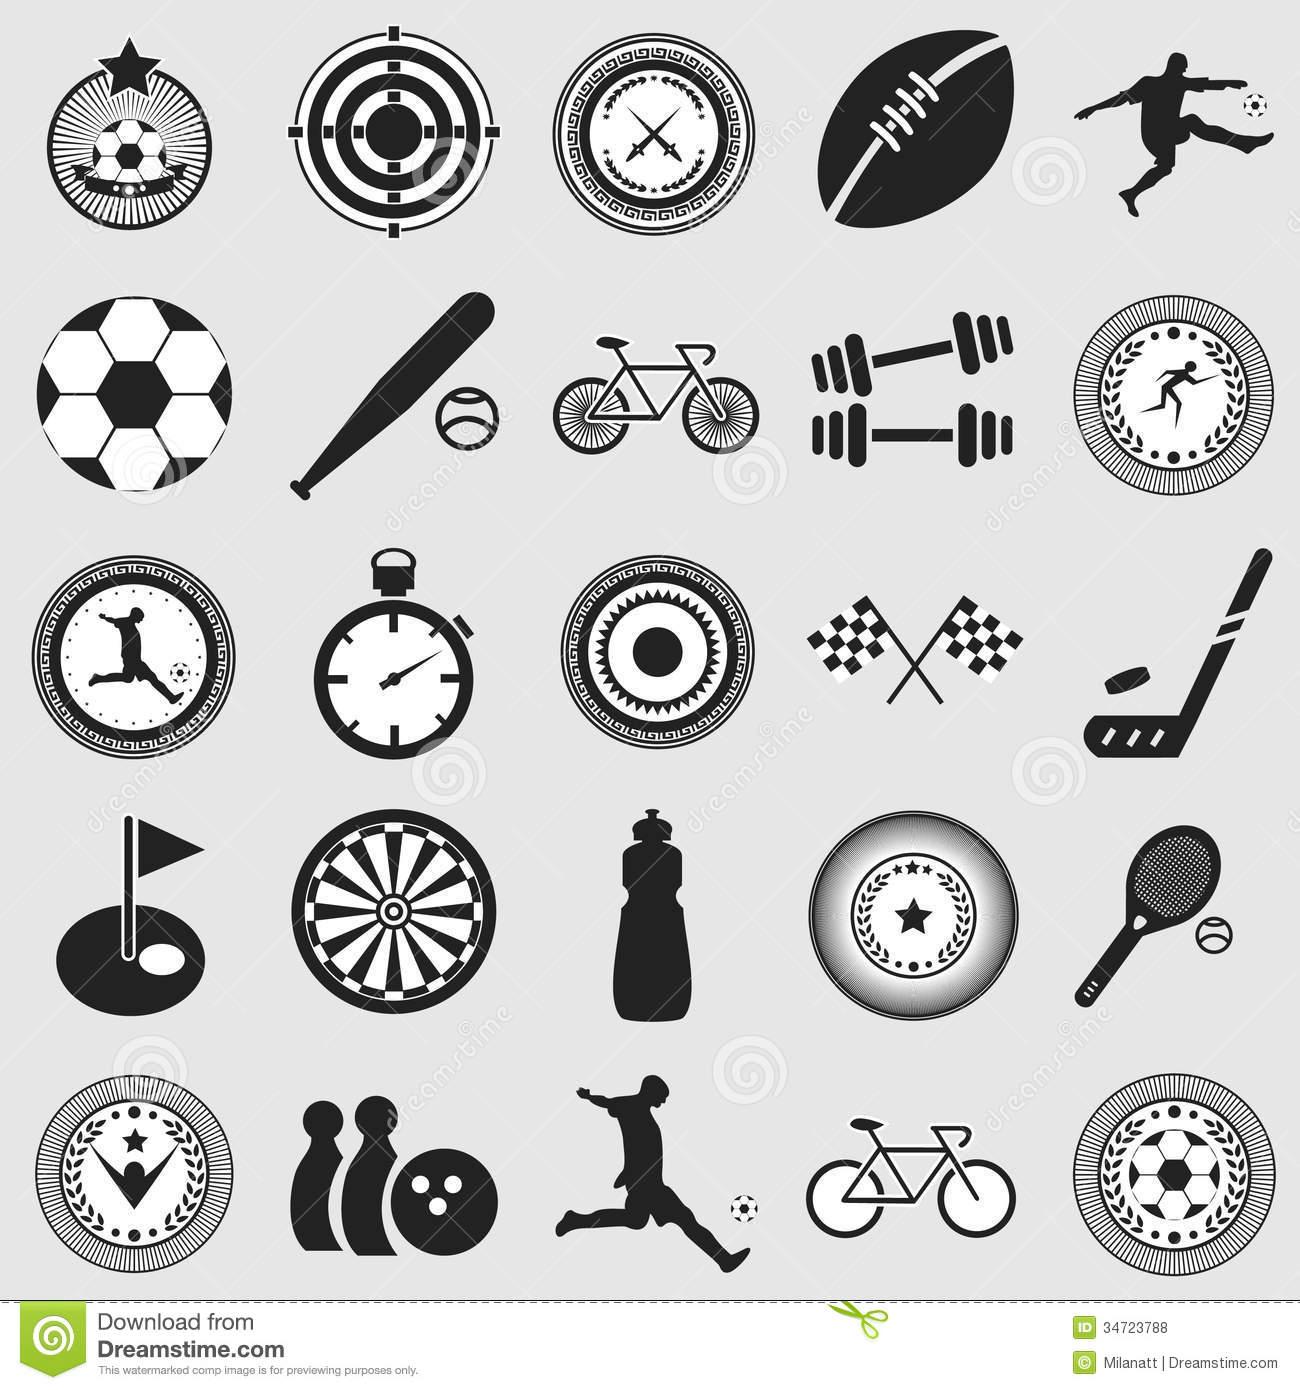 Royalty Free Sports Icon